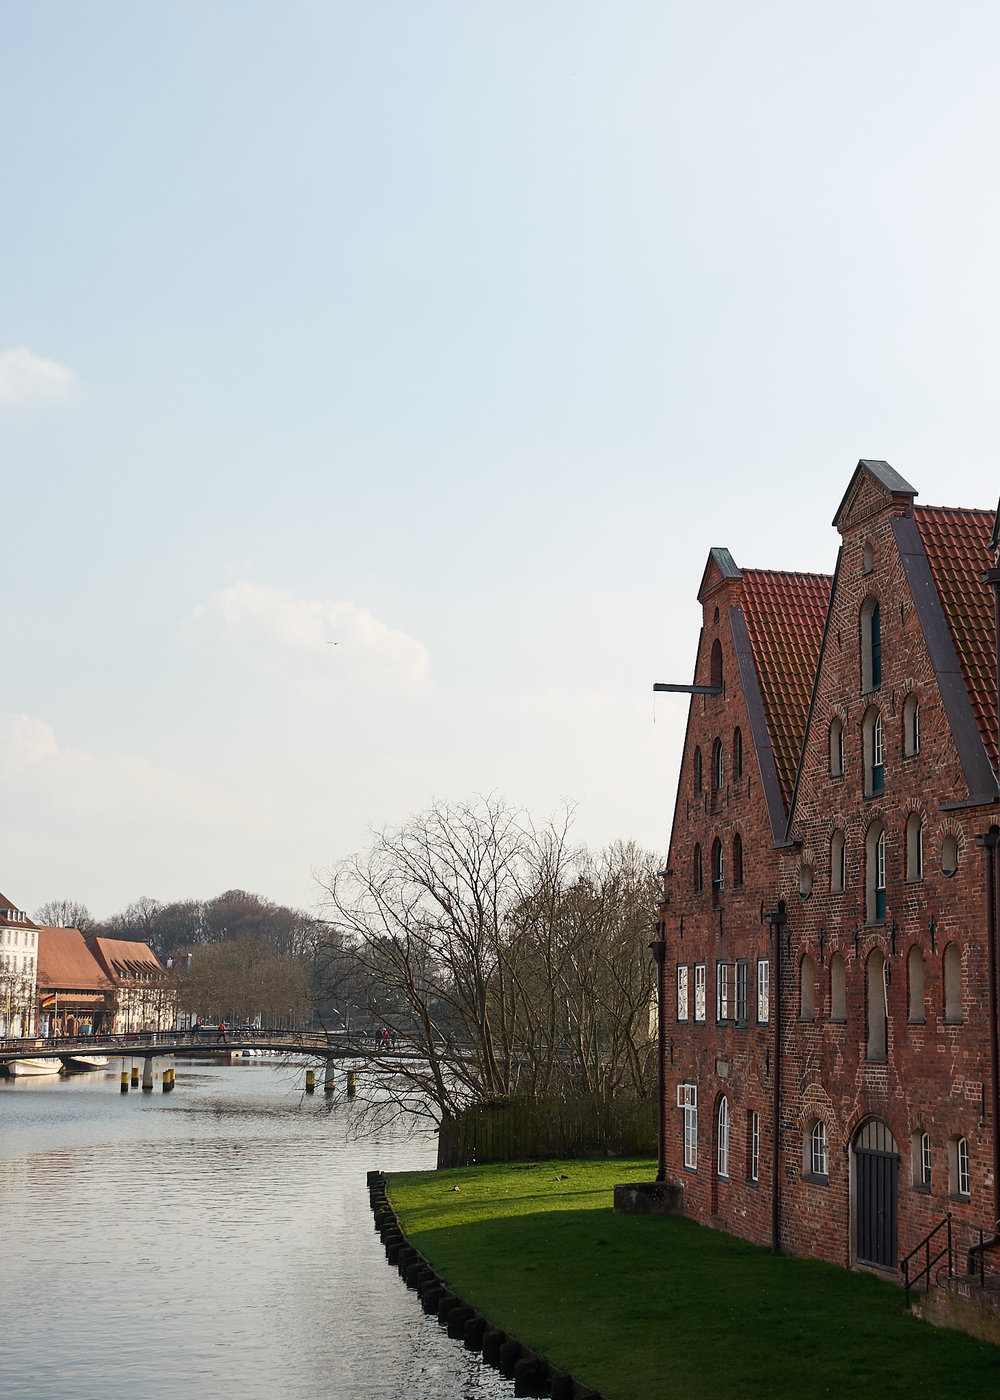 20190330-Lübeck-309.jpg